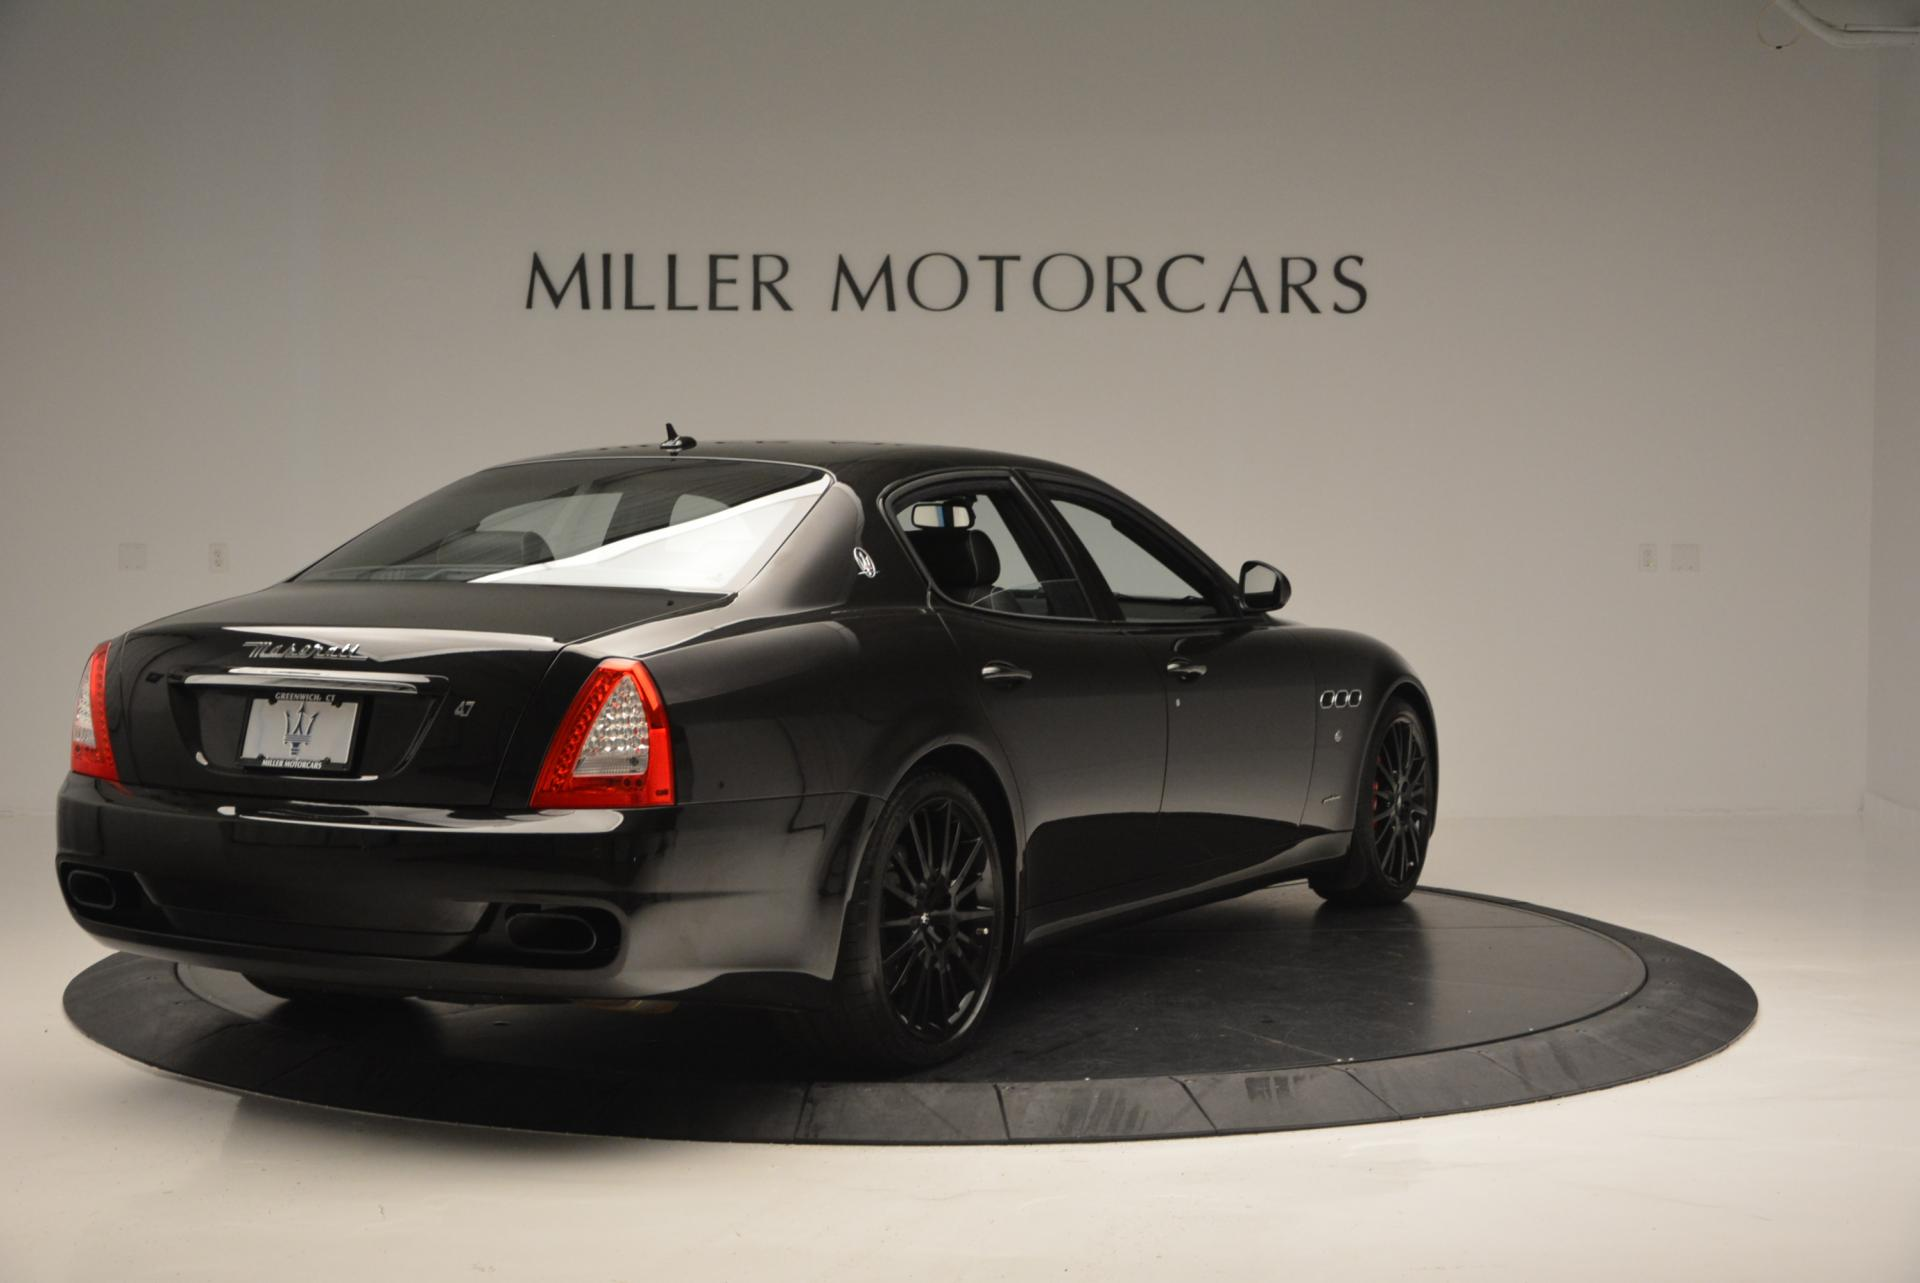 https://www.millermotorcars.com/galleria_images/531/531_p7_l.jpg